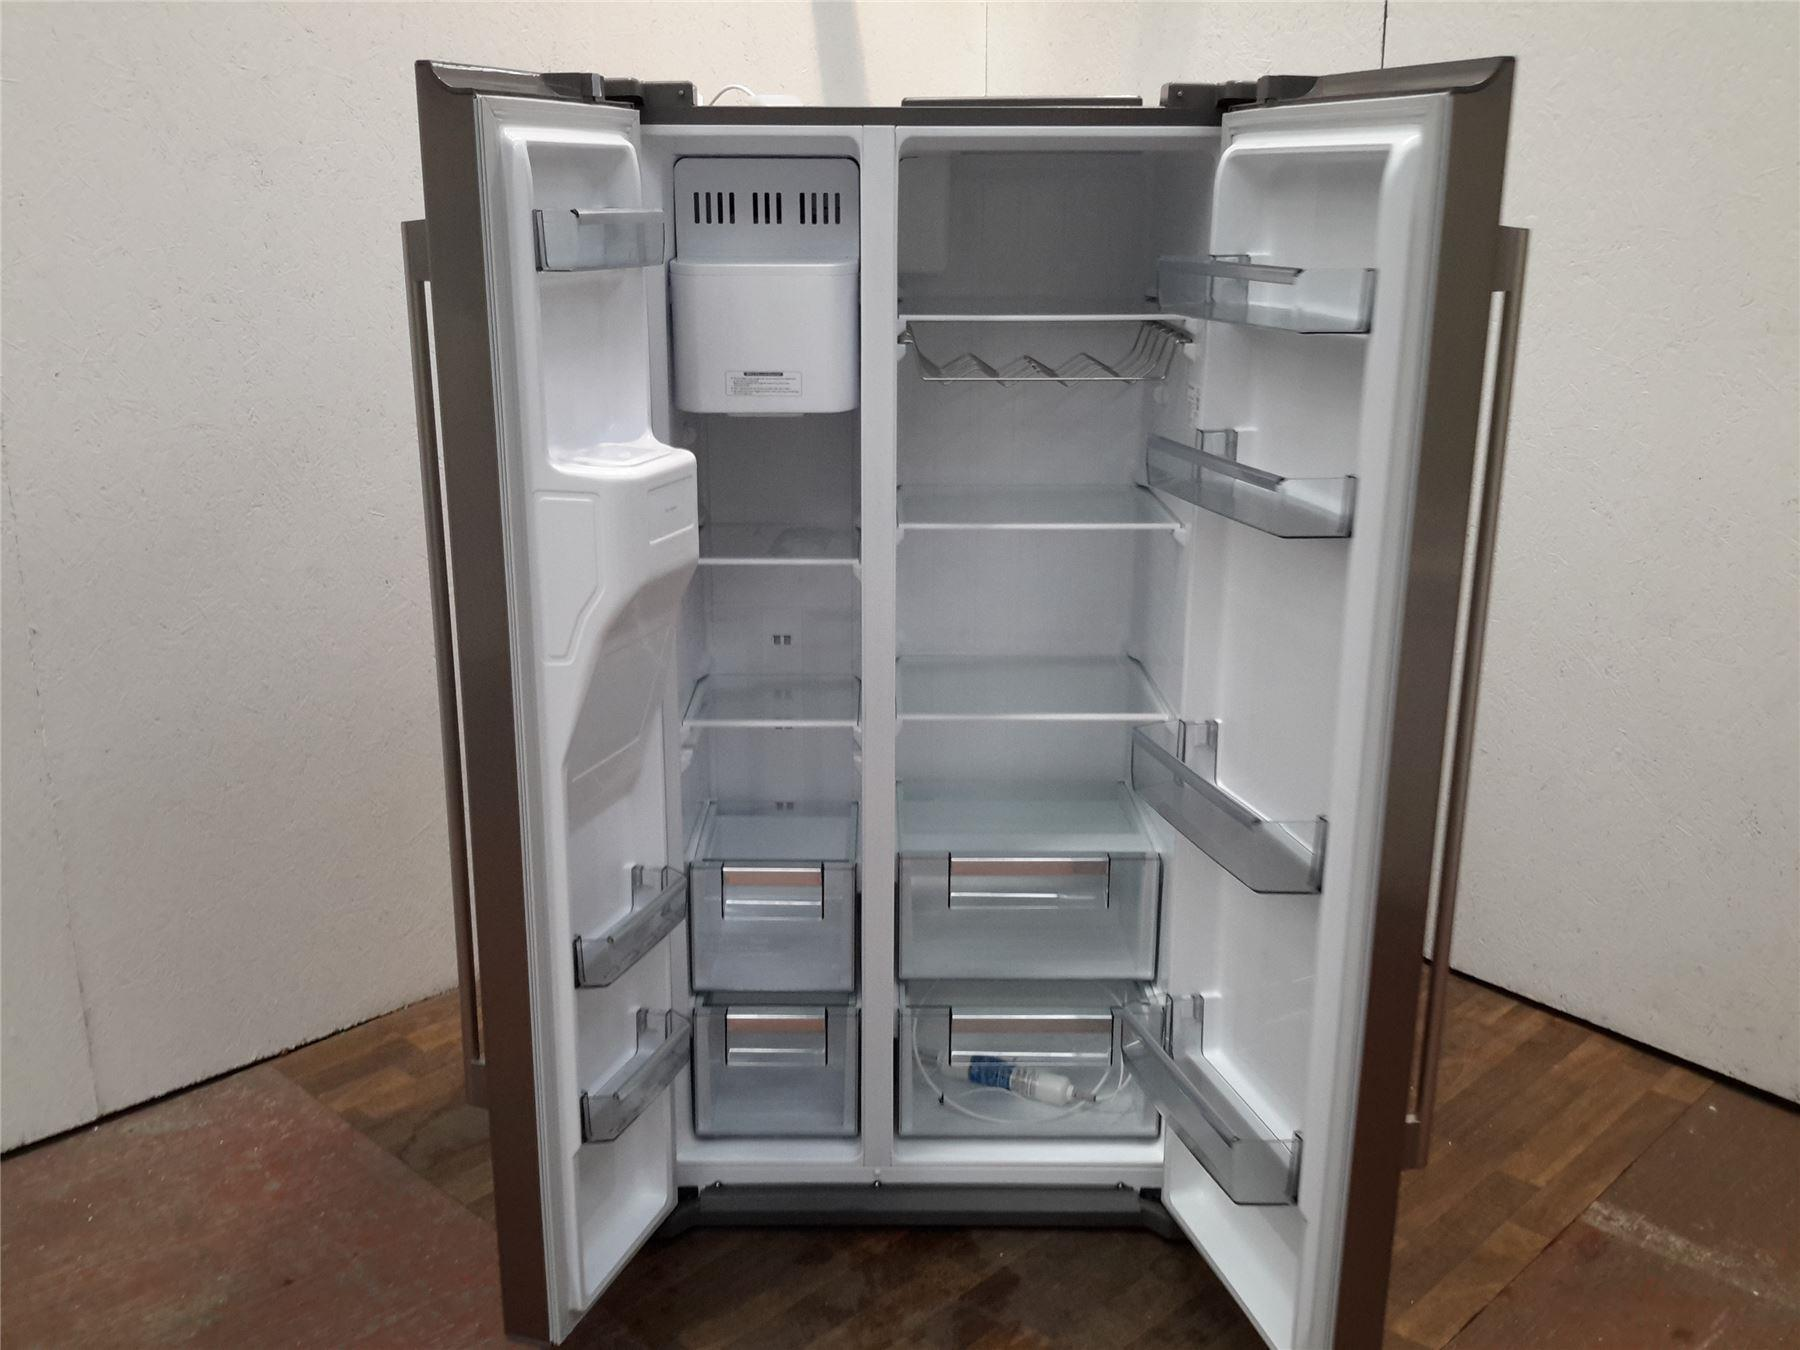 john lewis jlaffs2013 american style fridge freezer. Black Bedroom Furniture Sets. Home Design Ideas